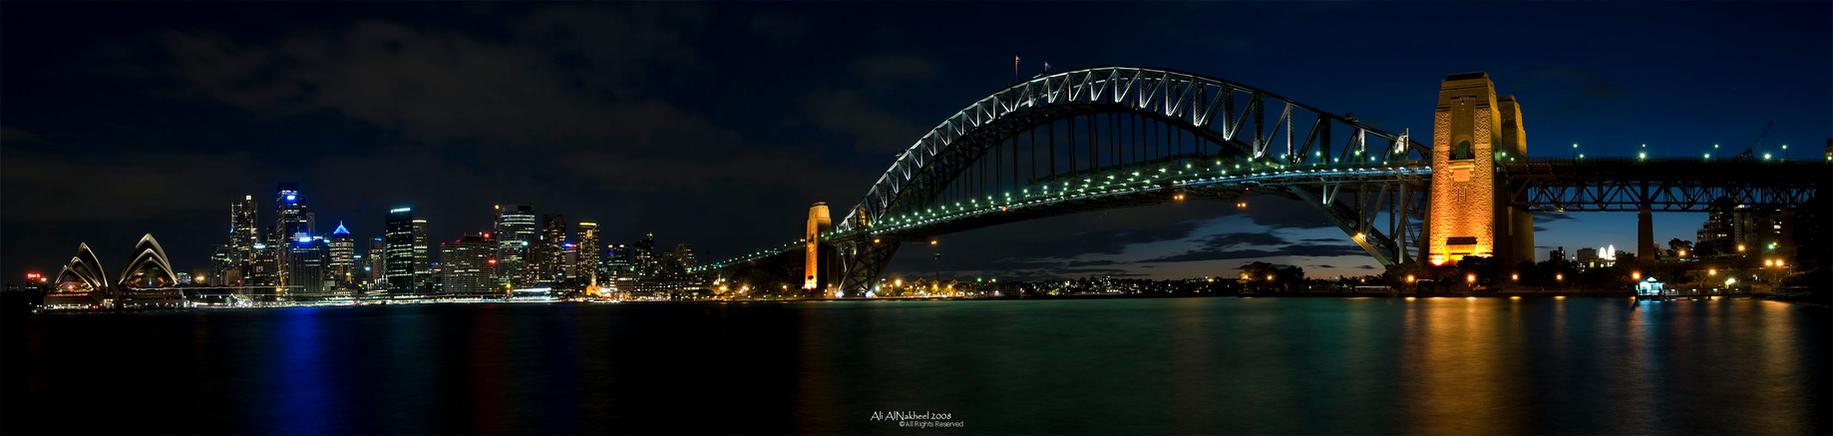 Panorama of Sydney Skyline IV by IAMSORRY87